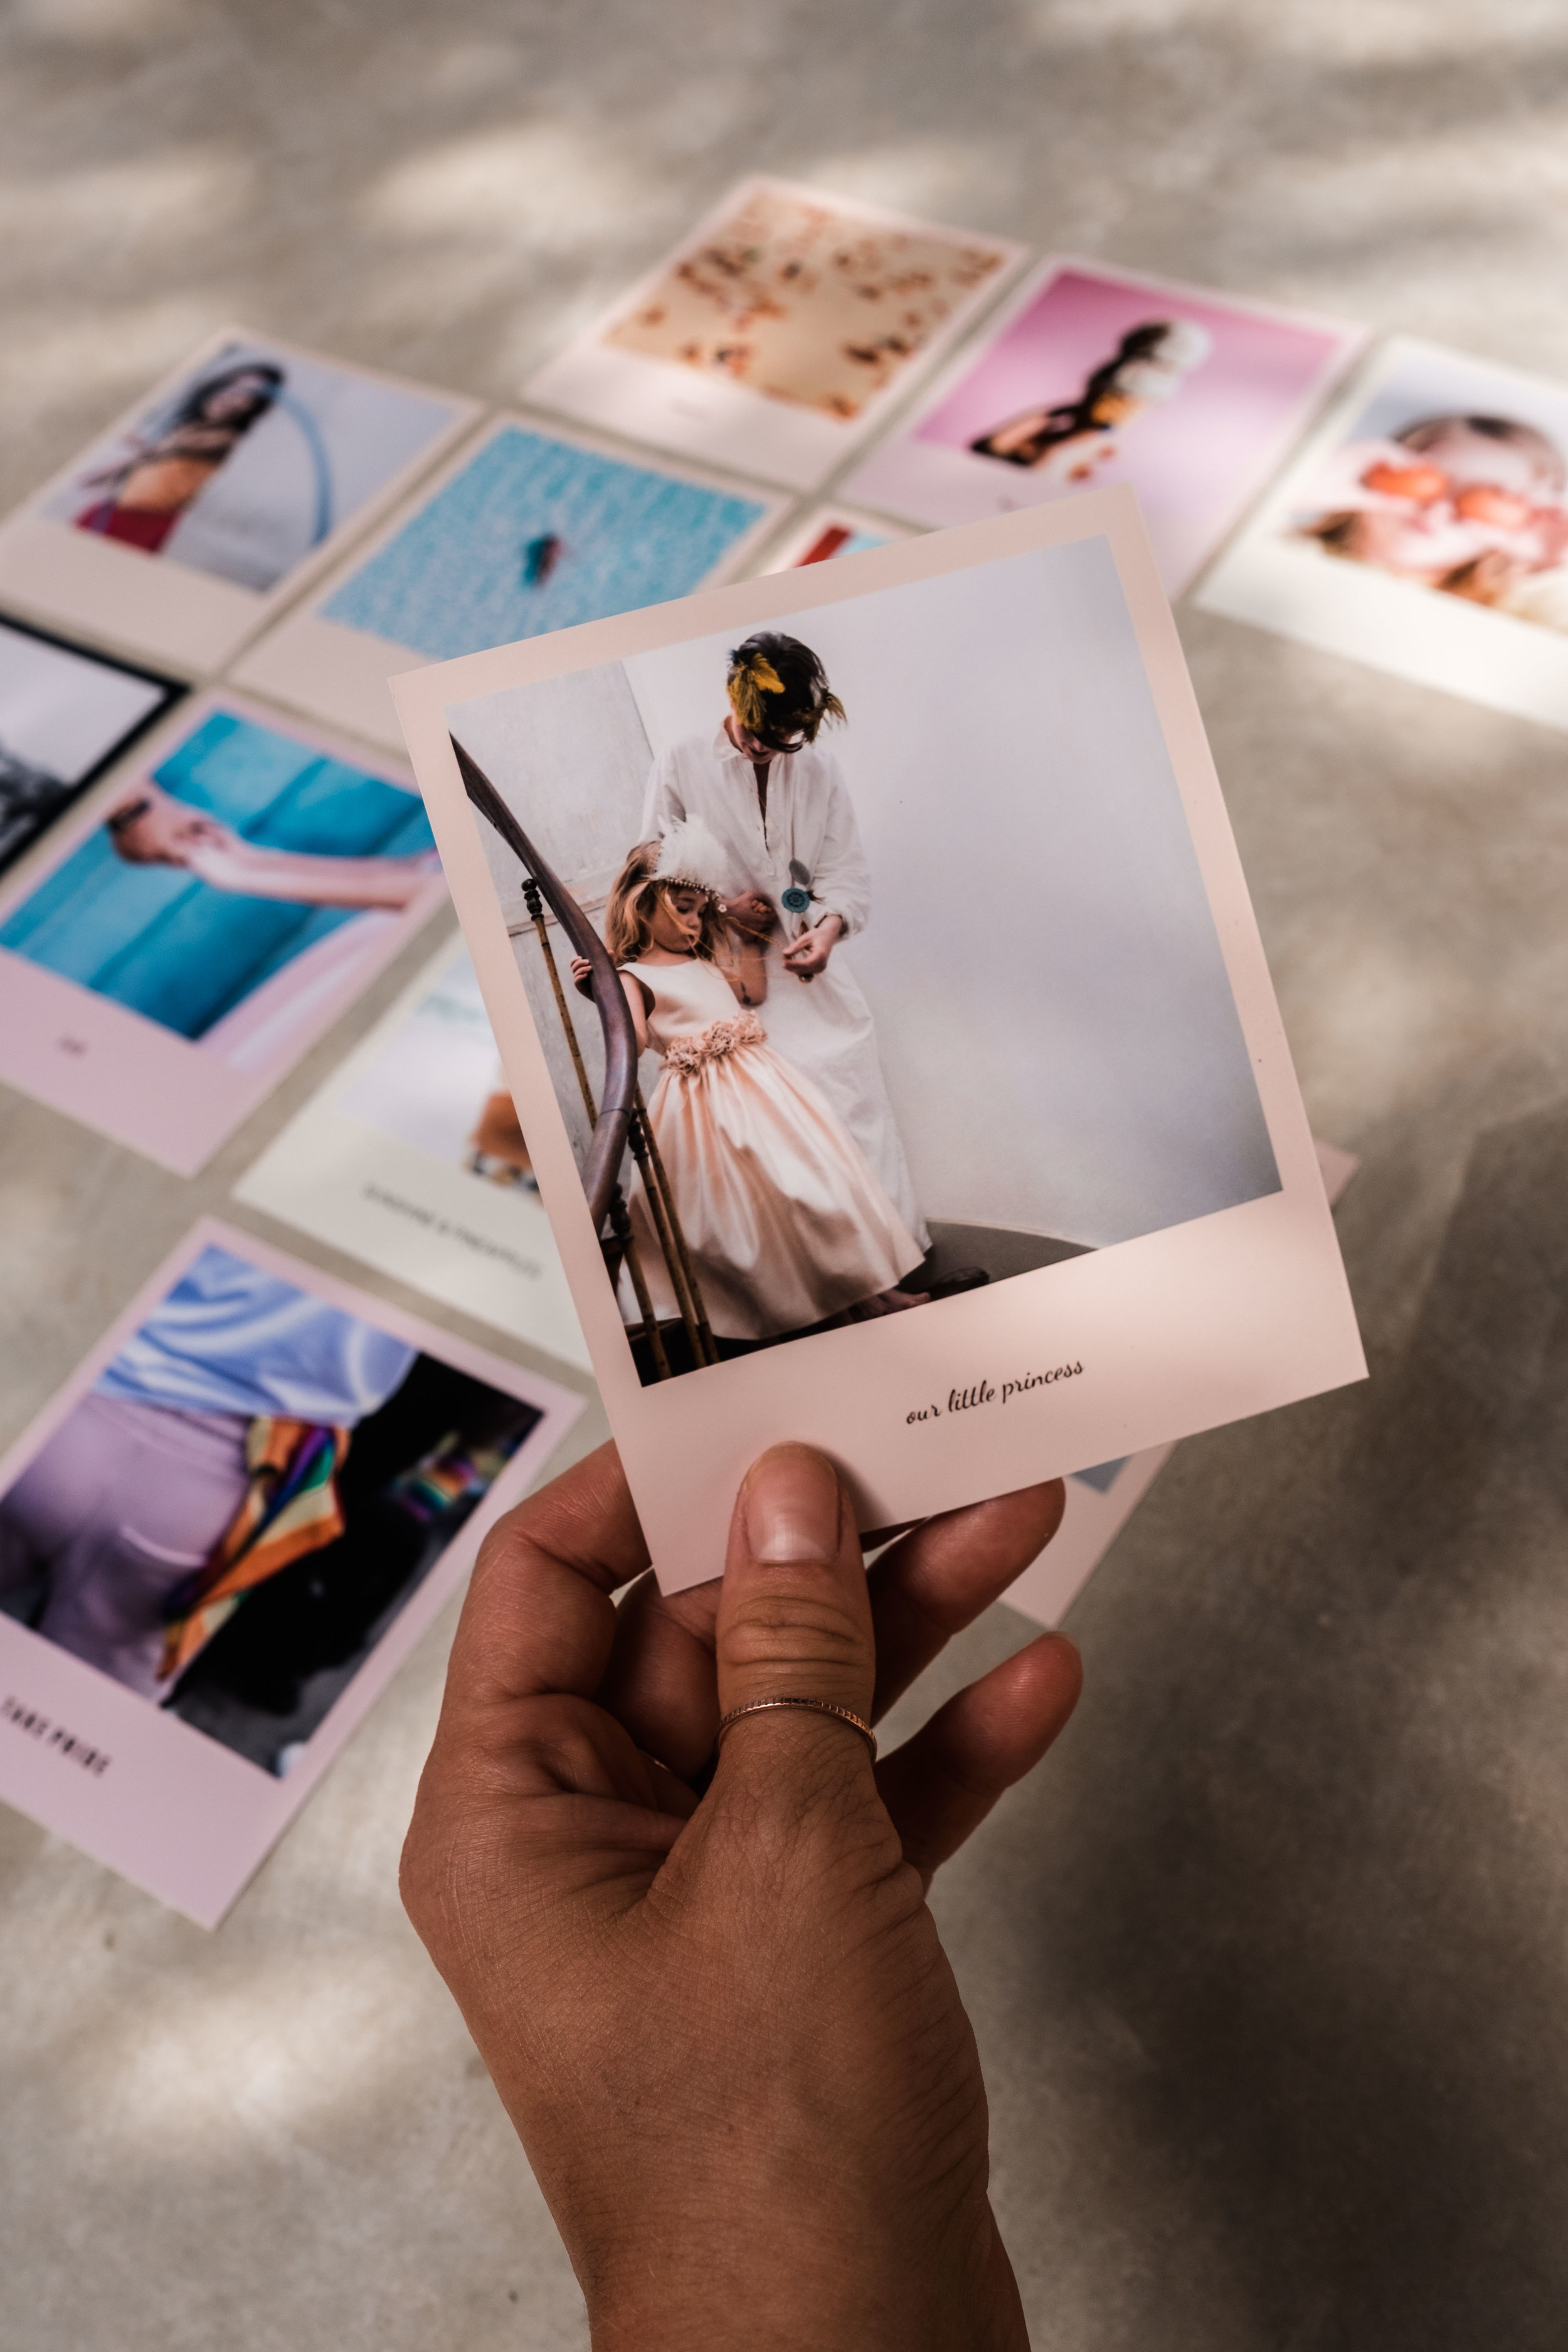 framkalla_app_appstore_retro_prints_weddings